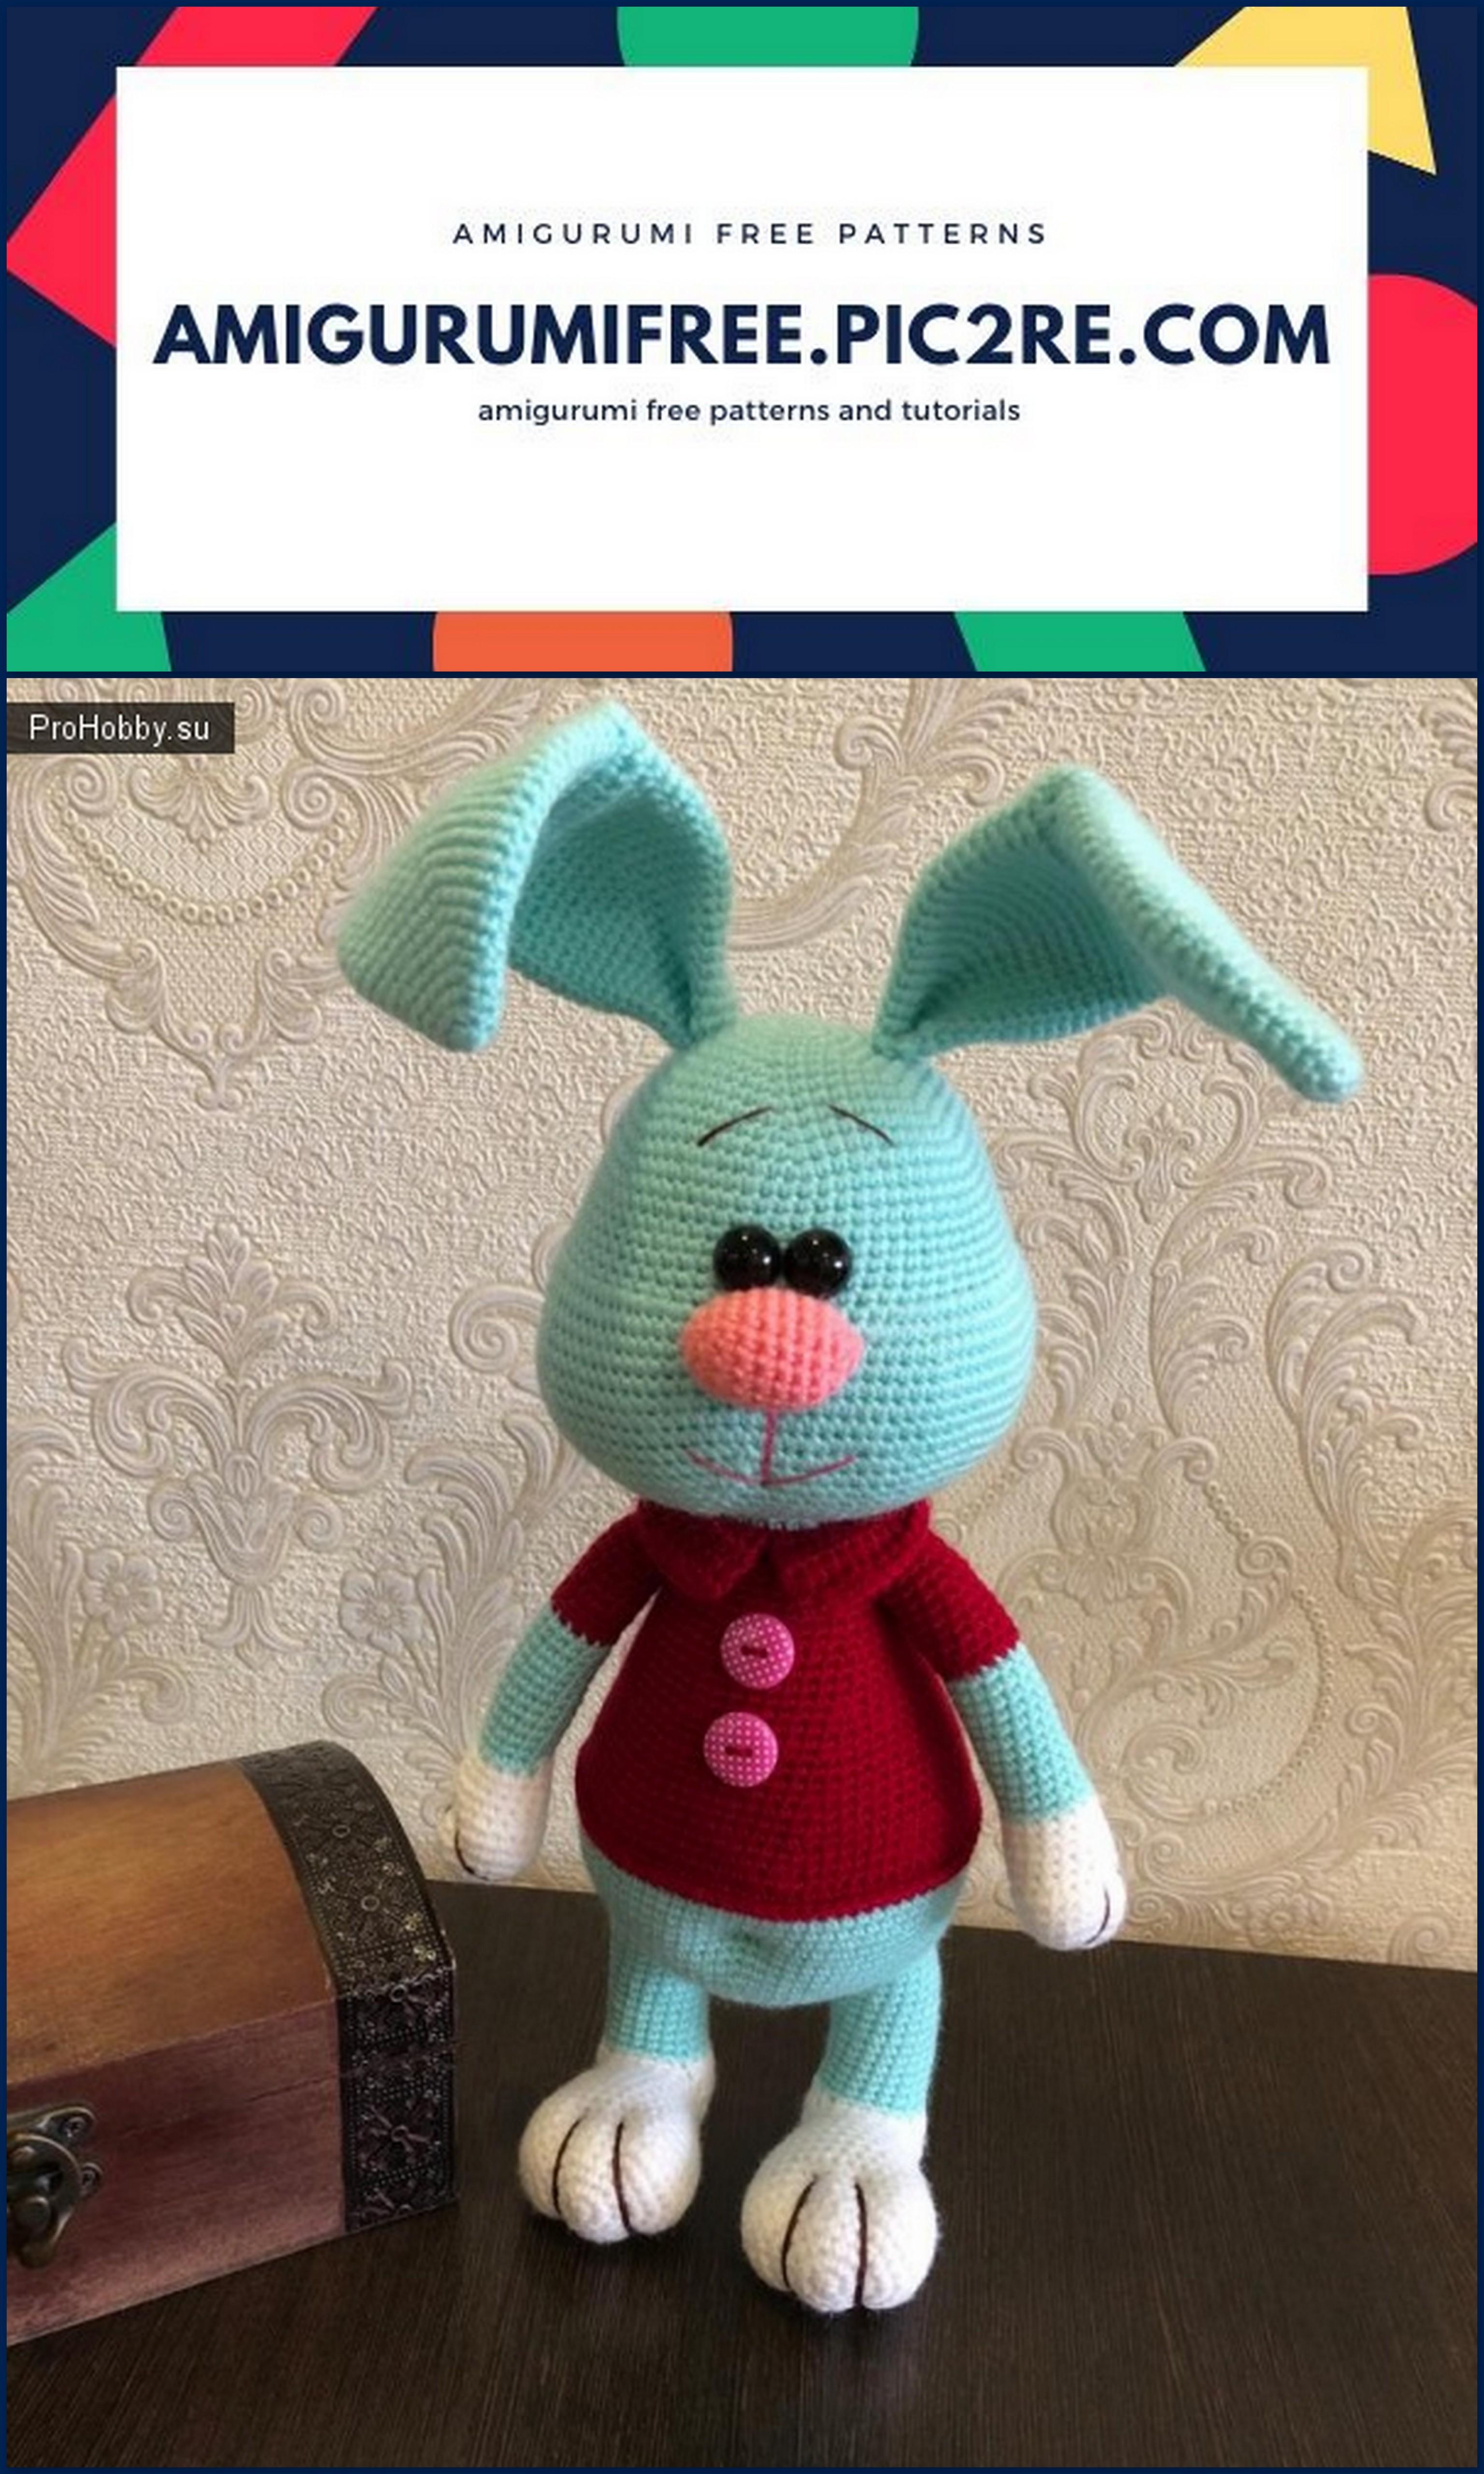 Amigurumi Cute Bunny Free Pattern | Häkeln für kinder ... | 5120x3072